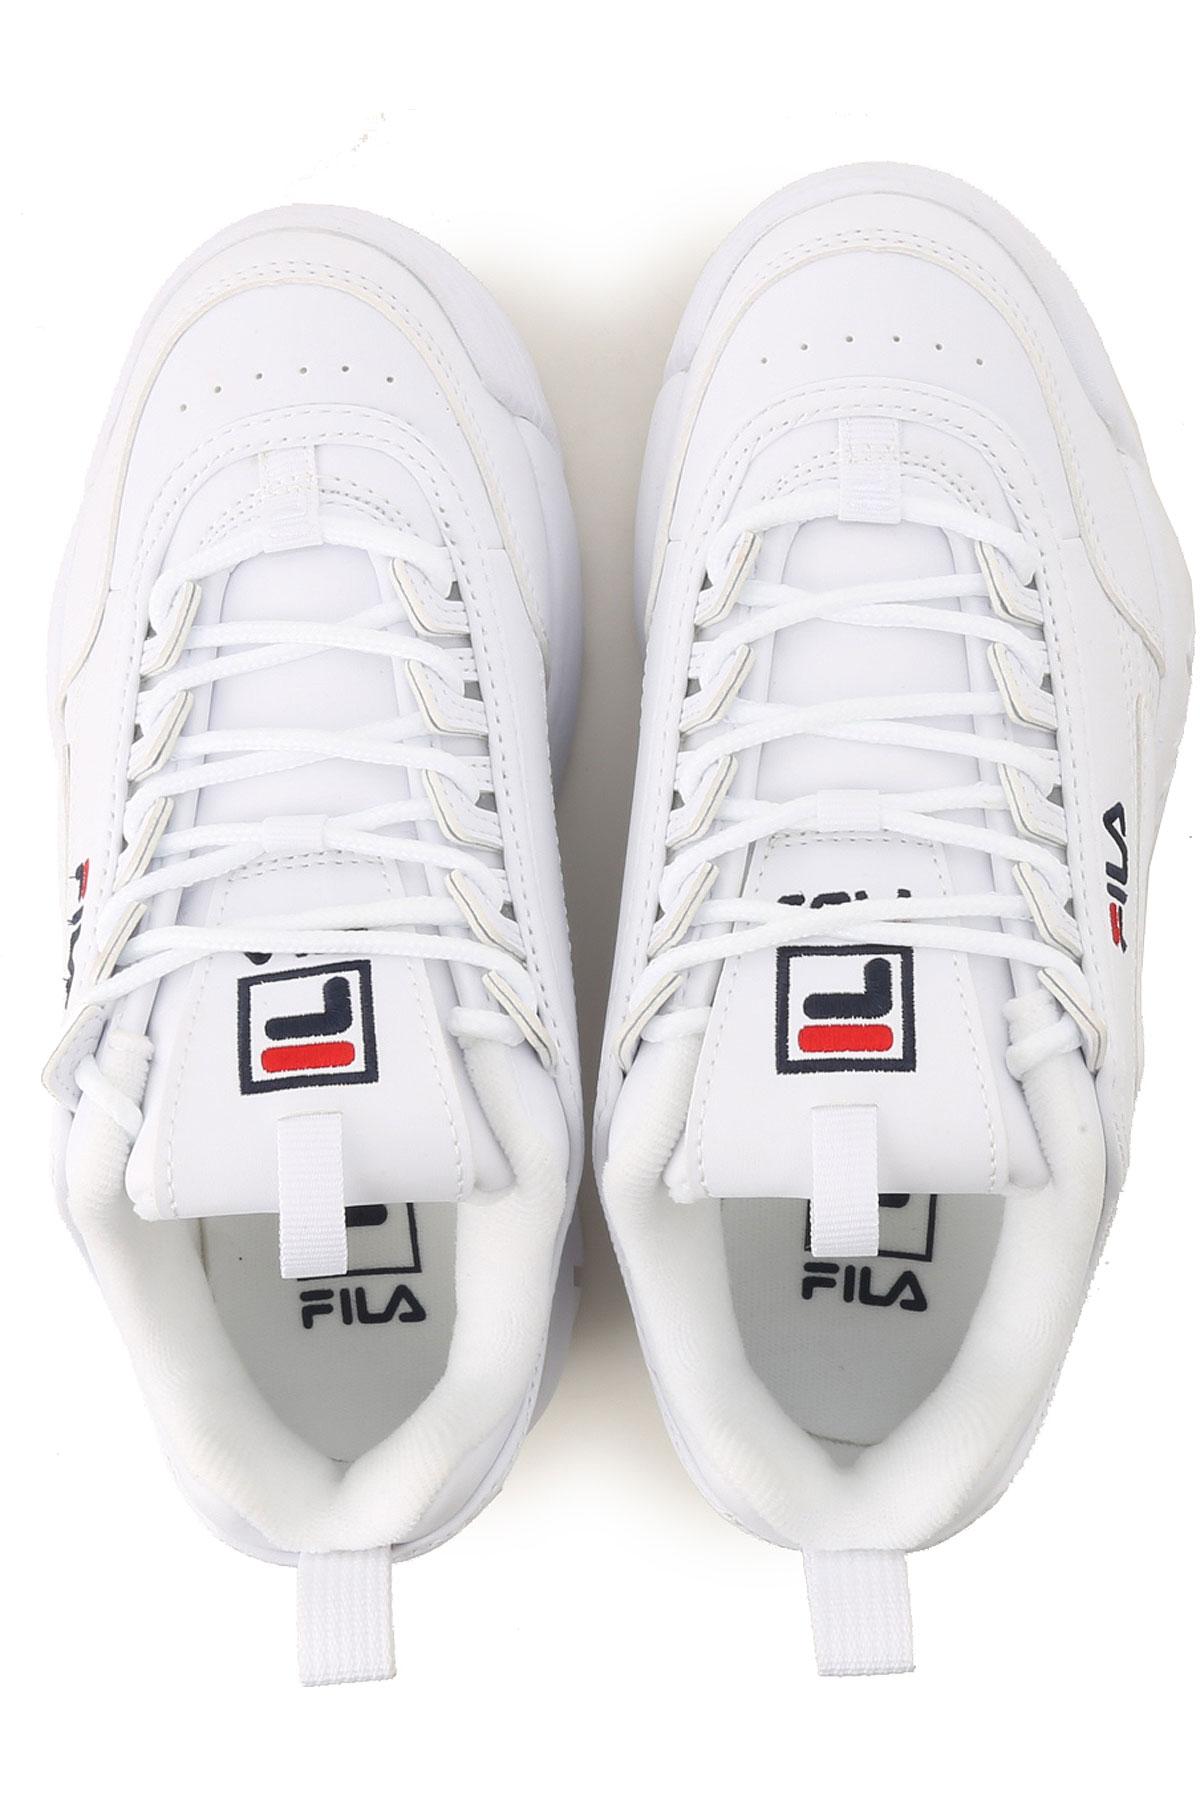 verano Mujer nbsp; Fila 2019 Primavera Para Zapatos Blanco TIIwU8q6